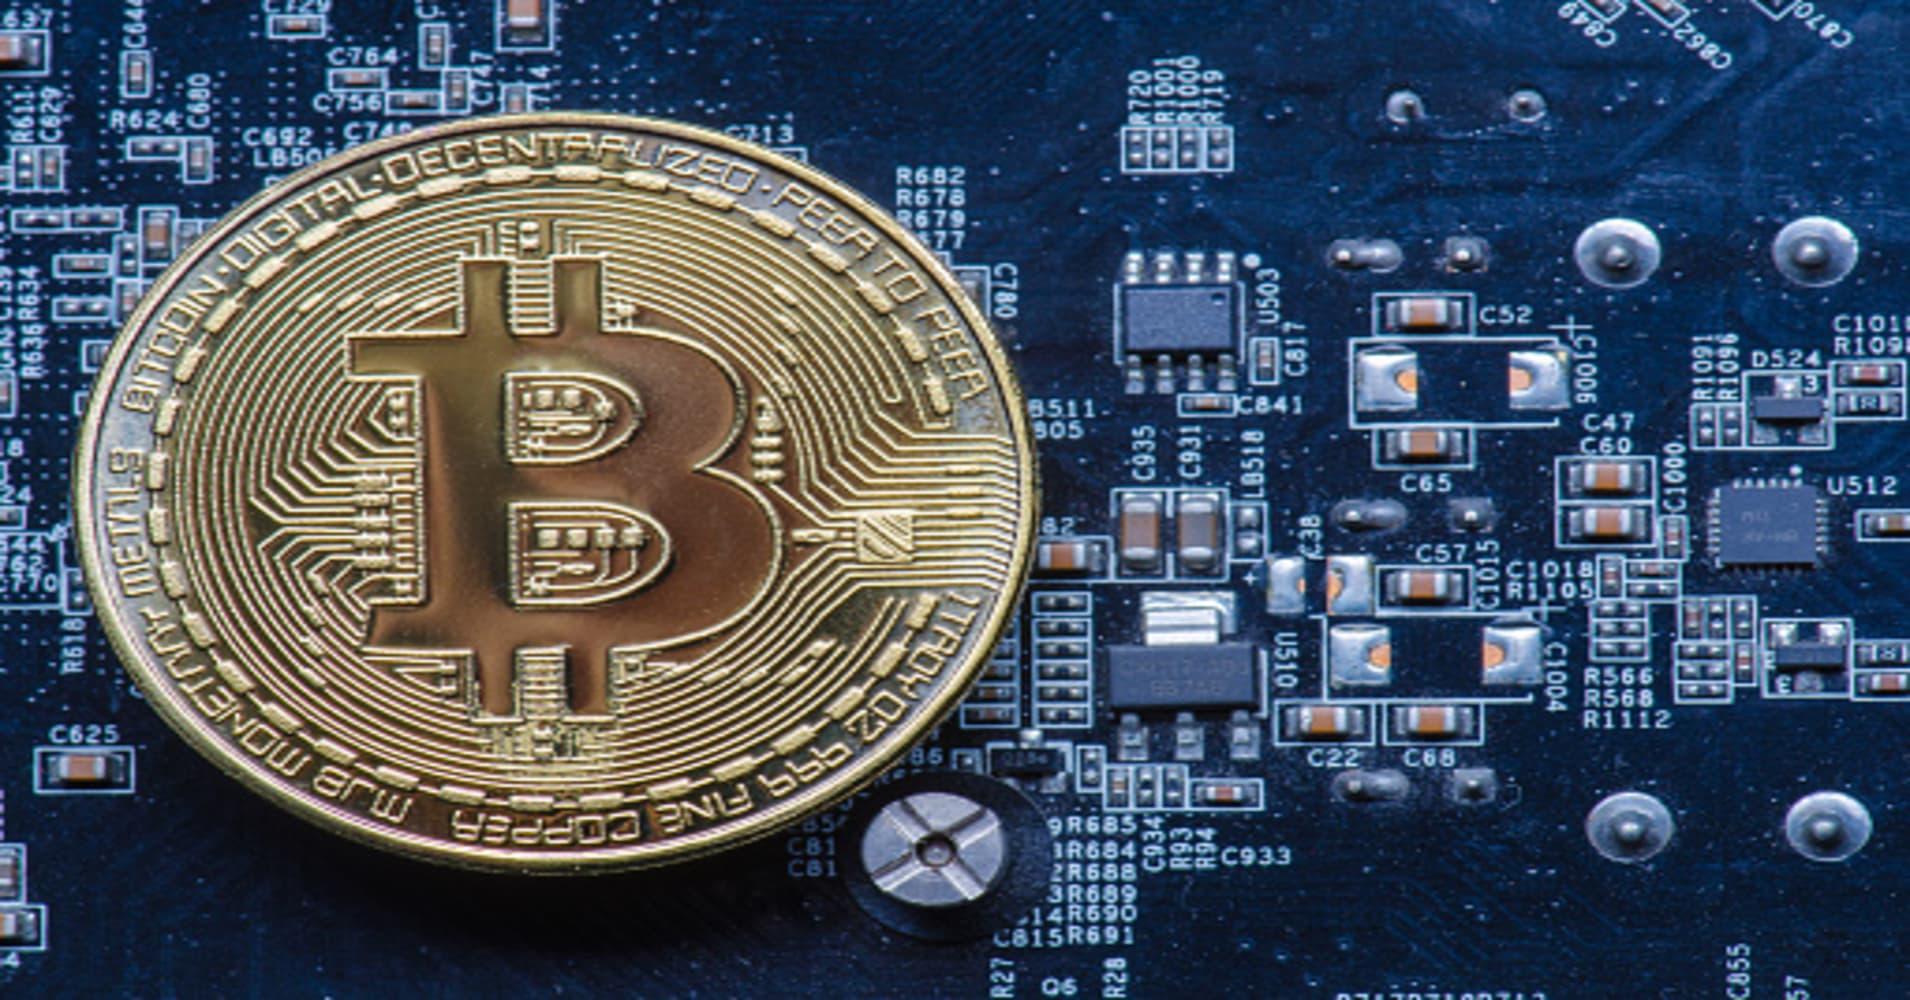 Bitcoin testing a key technical level